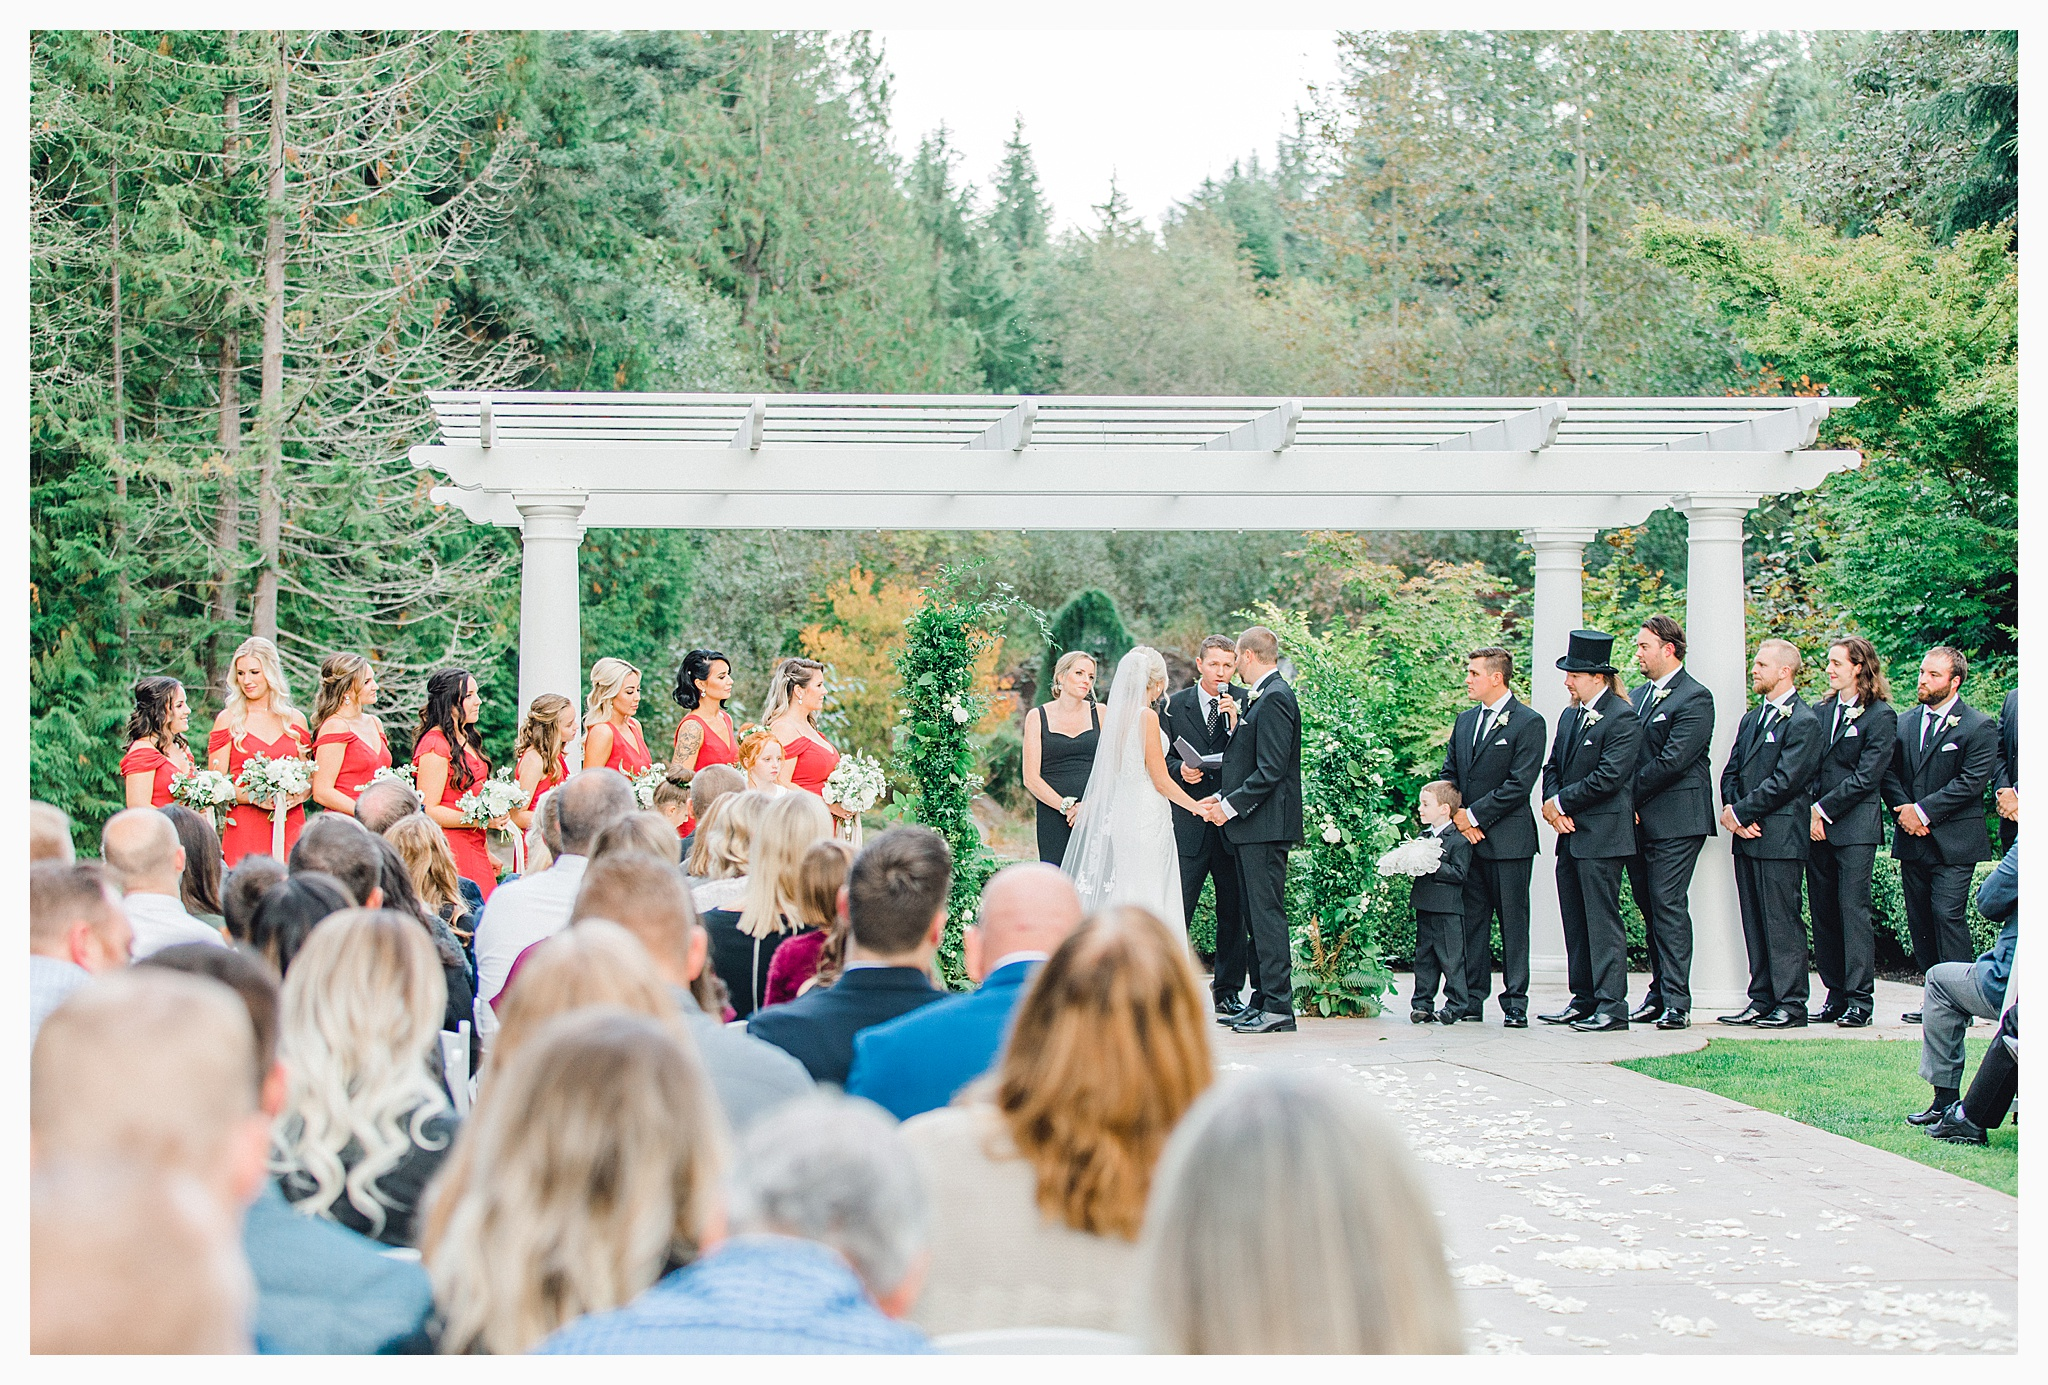 Emma Rose Company Light and Airy Wedding Photographer, Beautiful fall wedding at Rock Creek Gardens Venue in Puyallup, Washington._0078.jpg